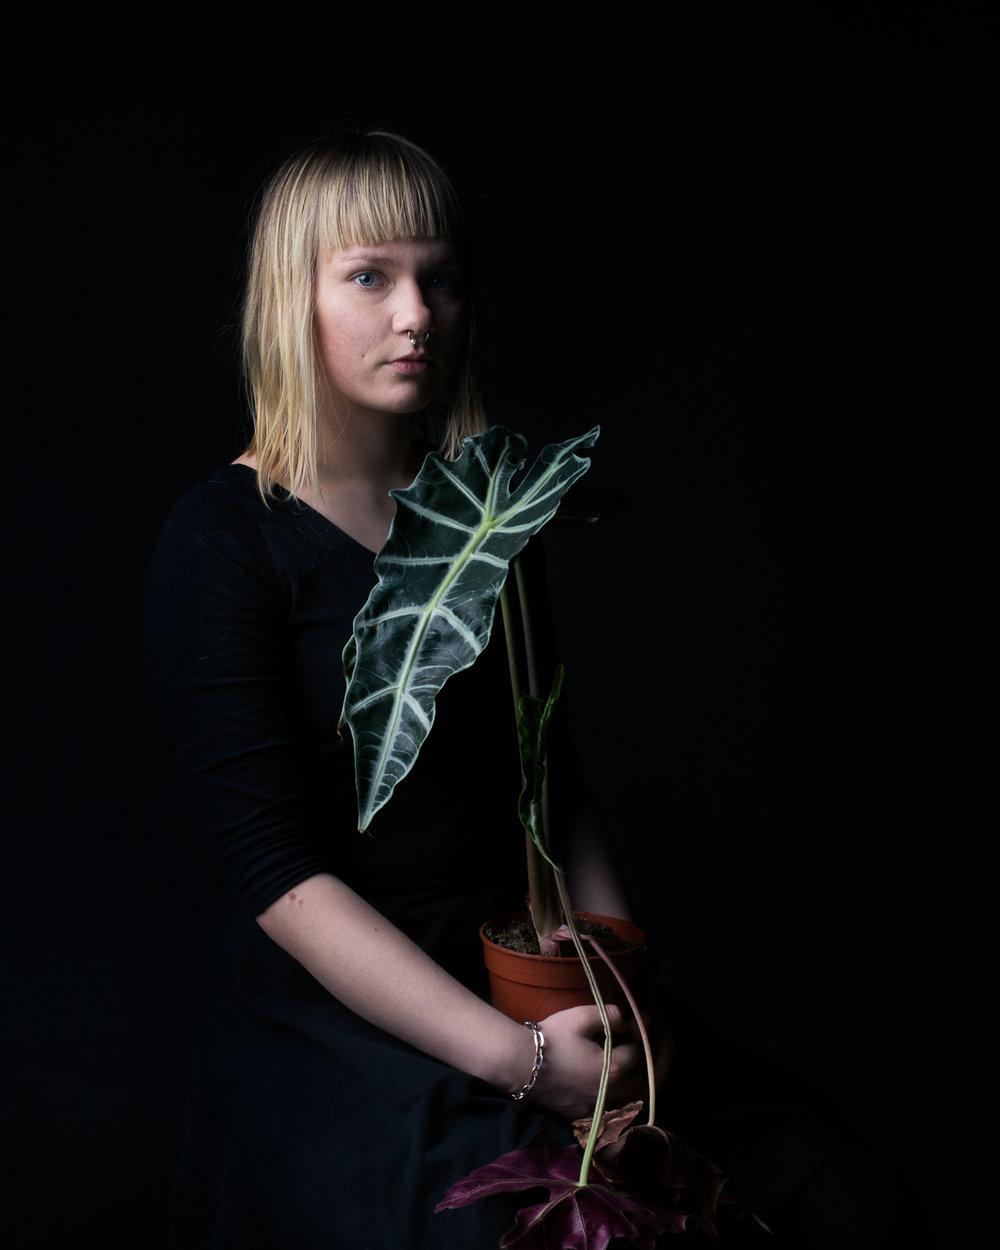 kasvini-anna-matilda-valli-5.JPG